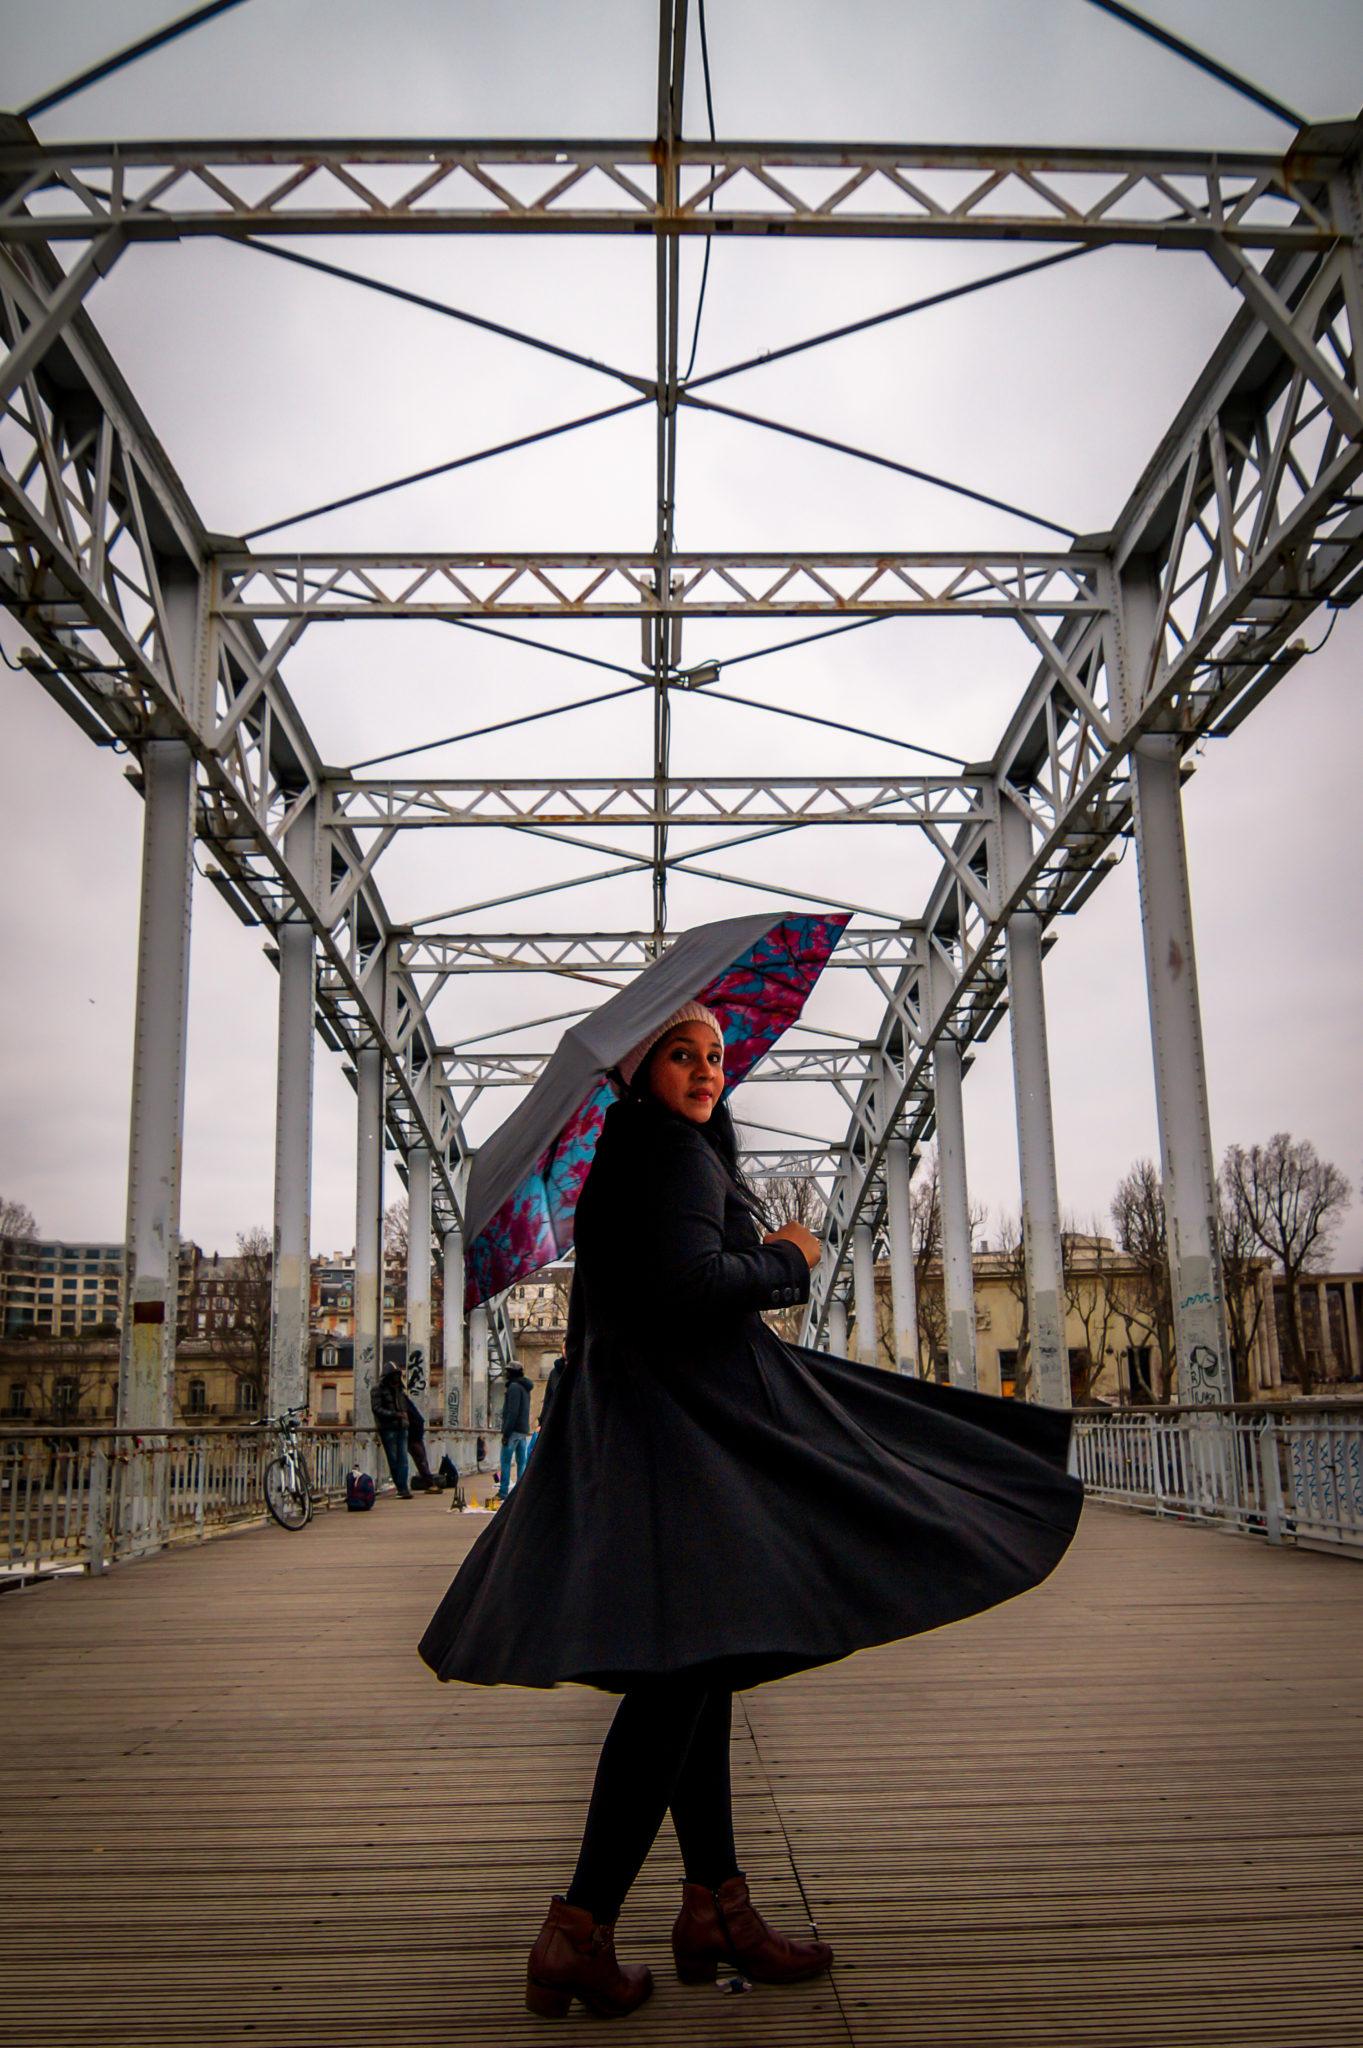 Hemaposesesvalises_Happysweeds_Cherry_Umbrella_Paris_Manteau_Max&co_blog_mode